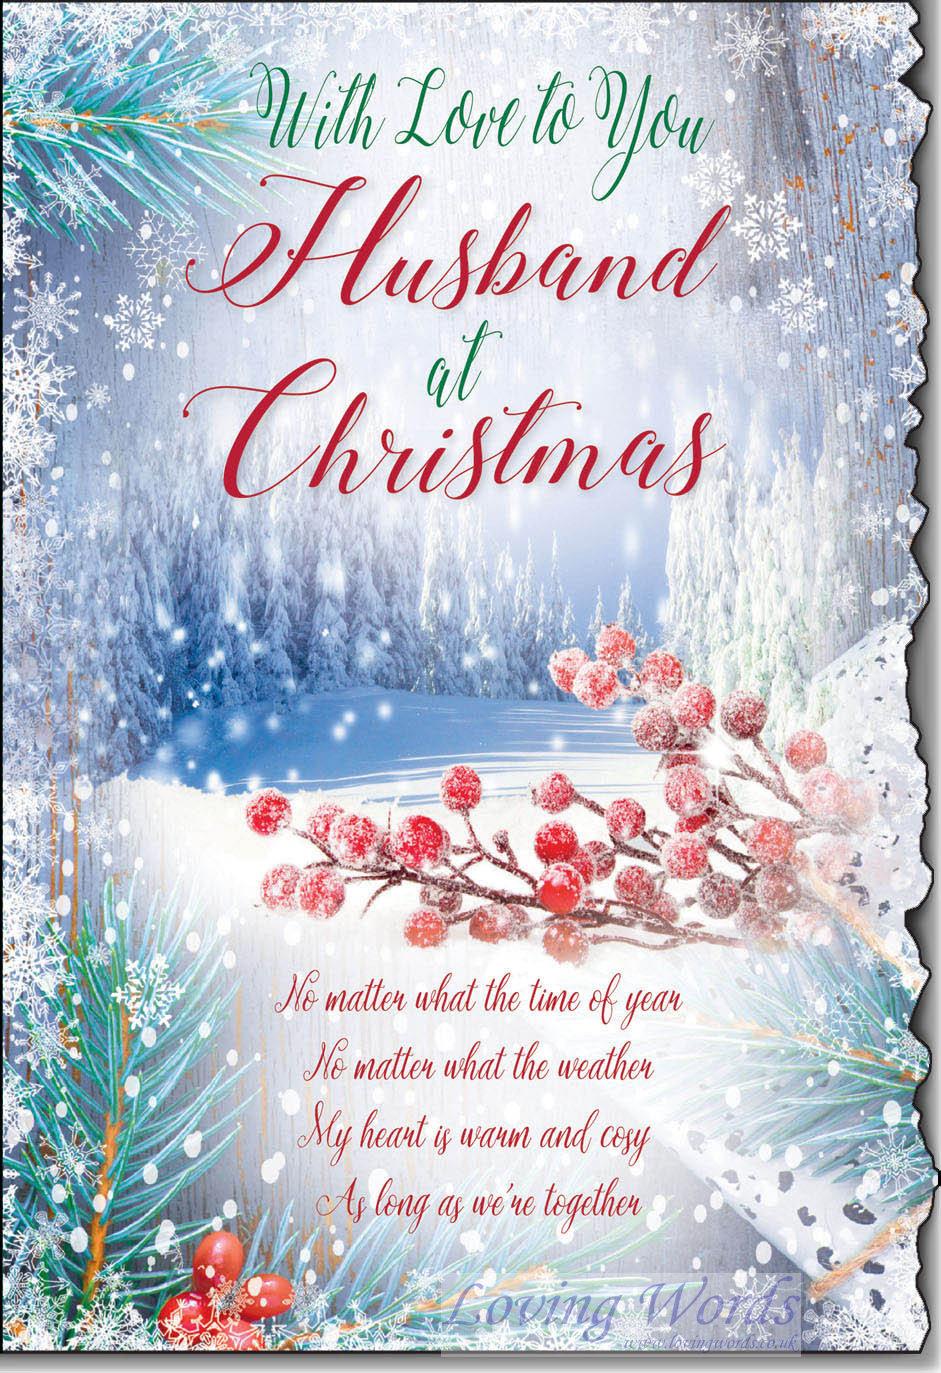 Husband Christmas Cards Uk.Husband At Christmas Greeting Cards By Loving Words